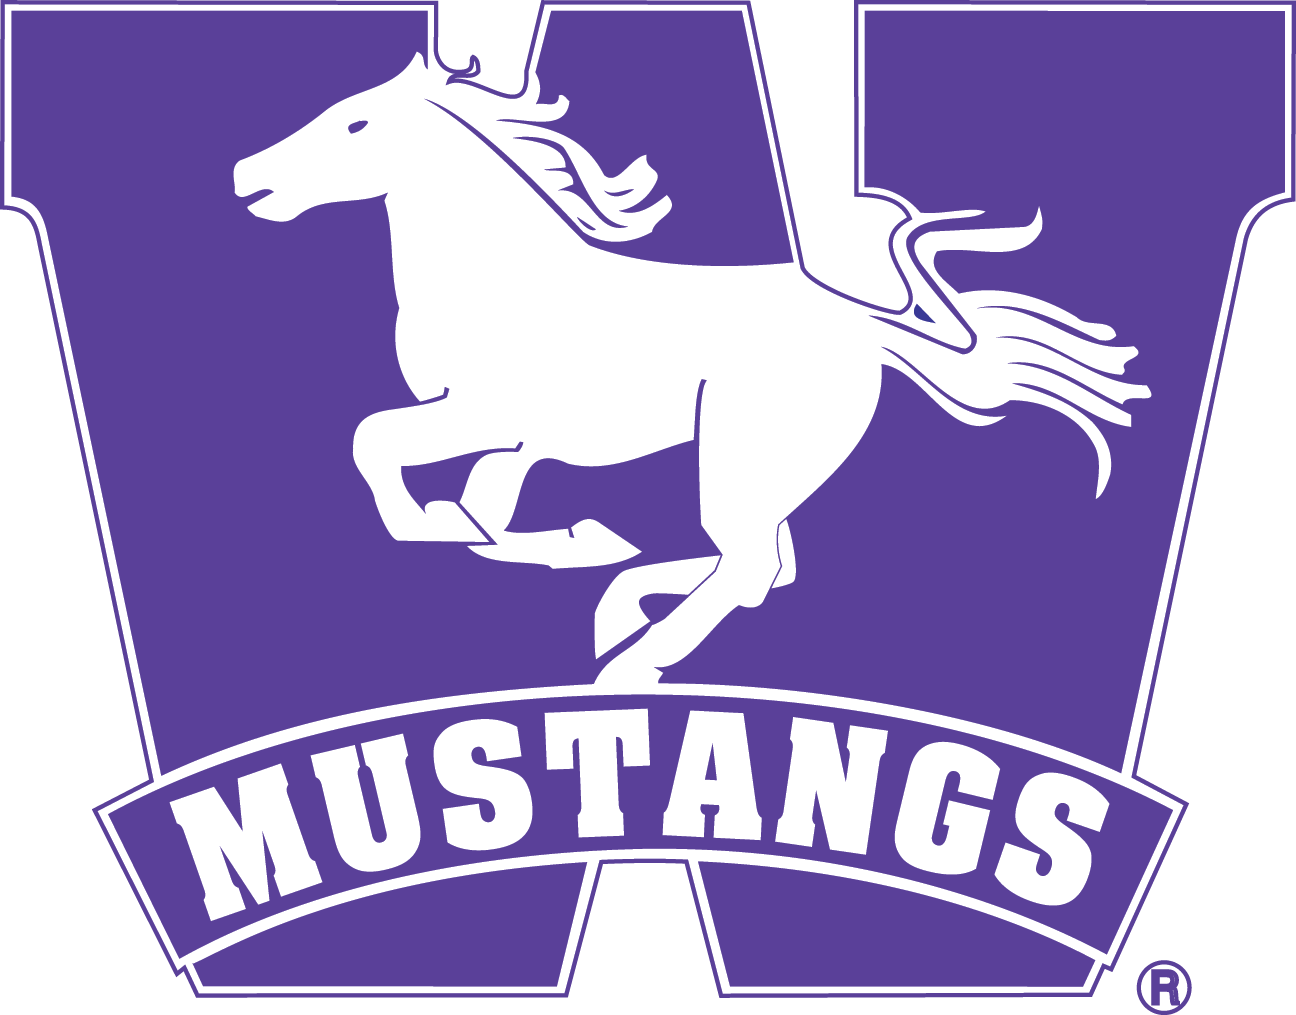 Mustang clipart mustang emblem. Logo communications western university